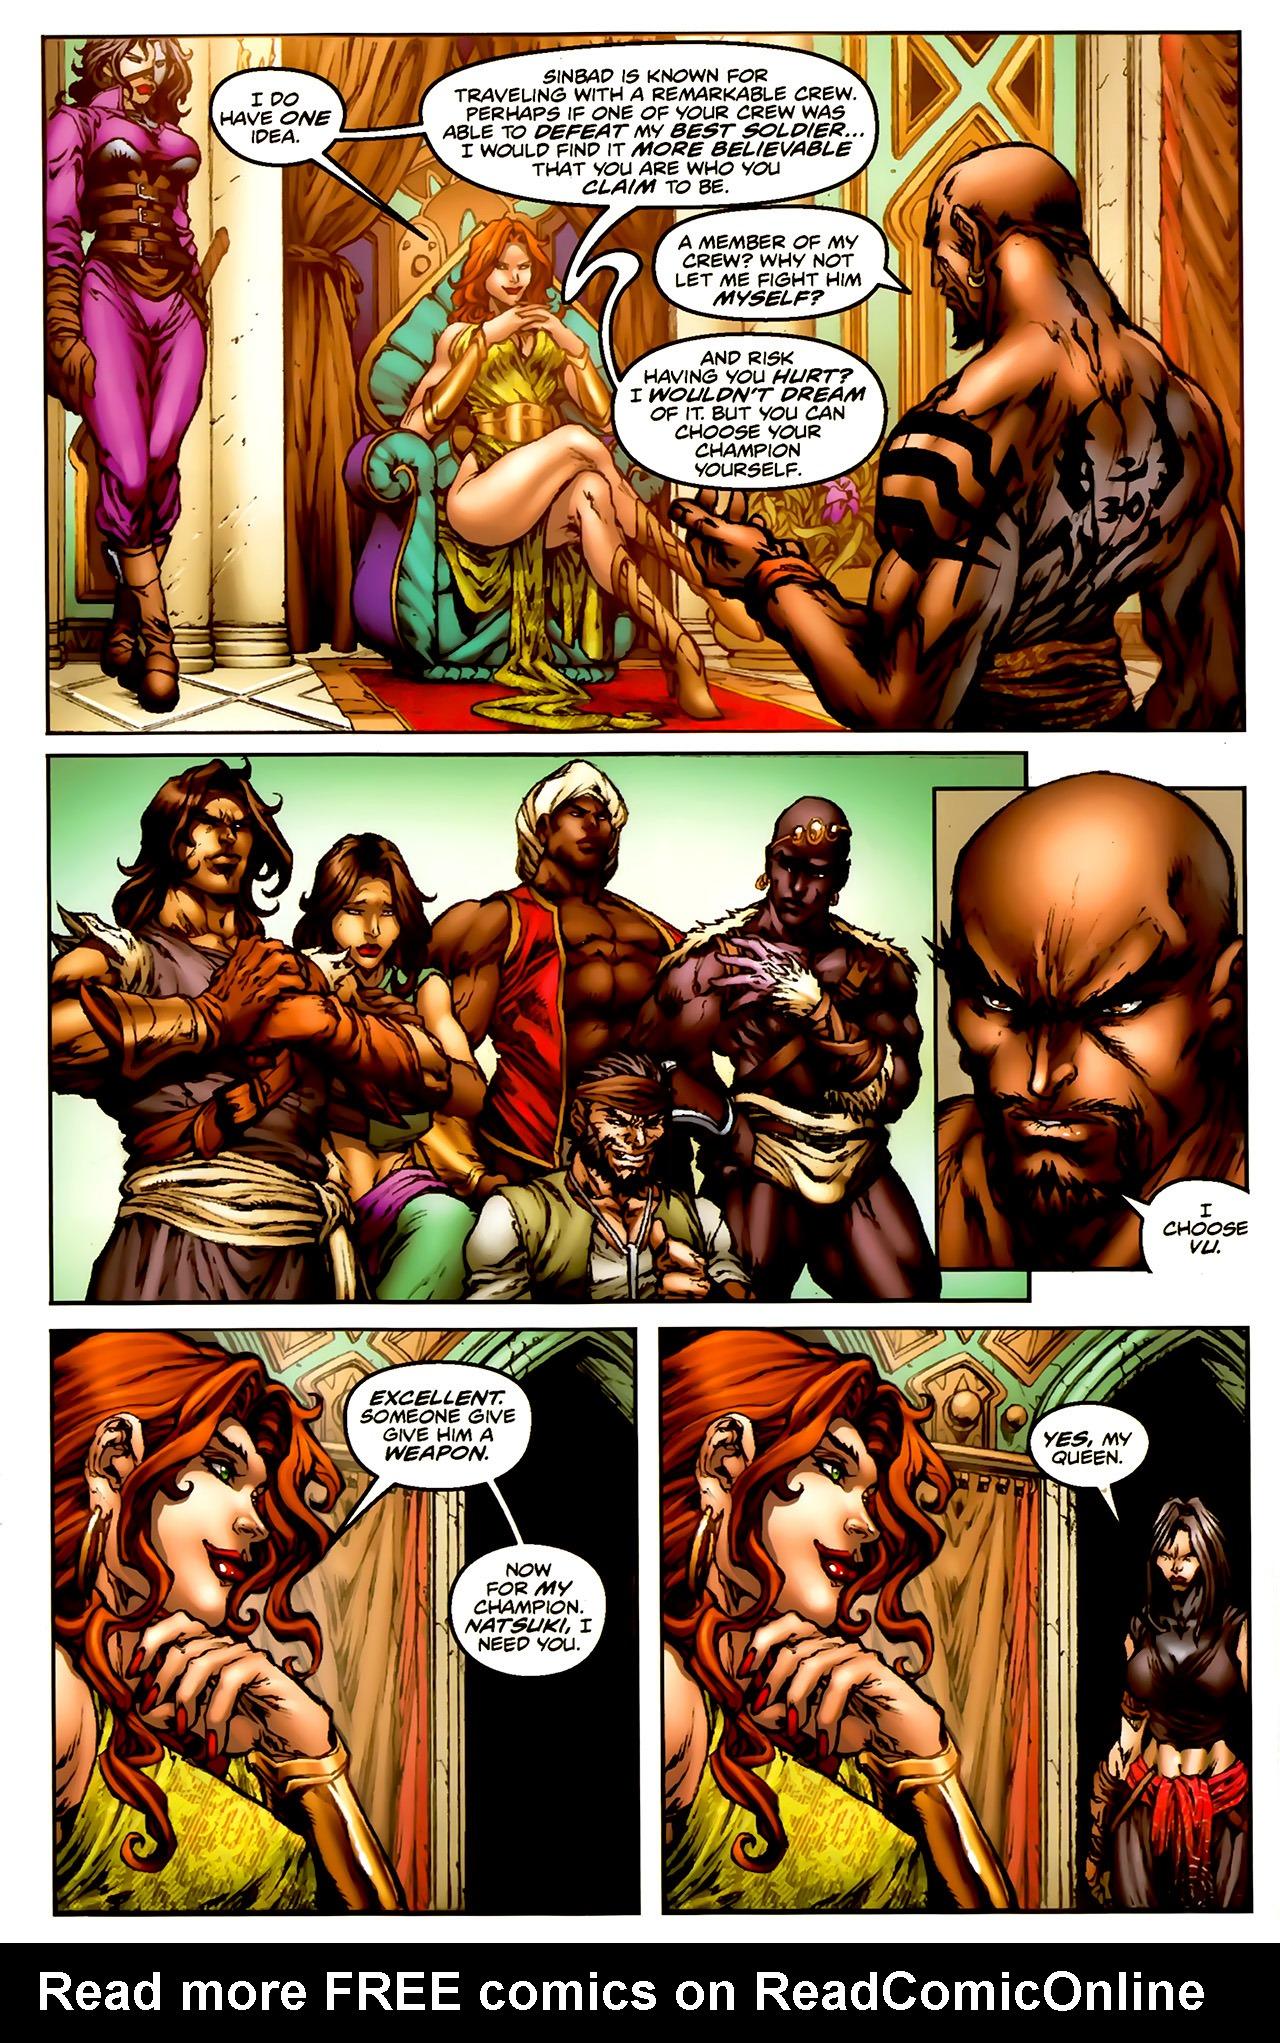 Read online 1001 Arabian Nights: The Adventures of Sinbad comic -  Issue #1 - 20